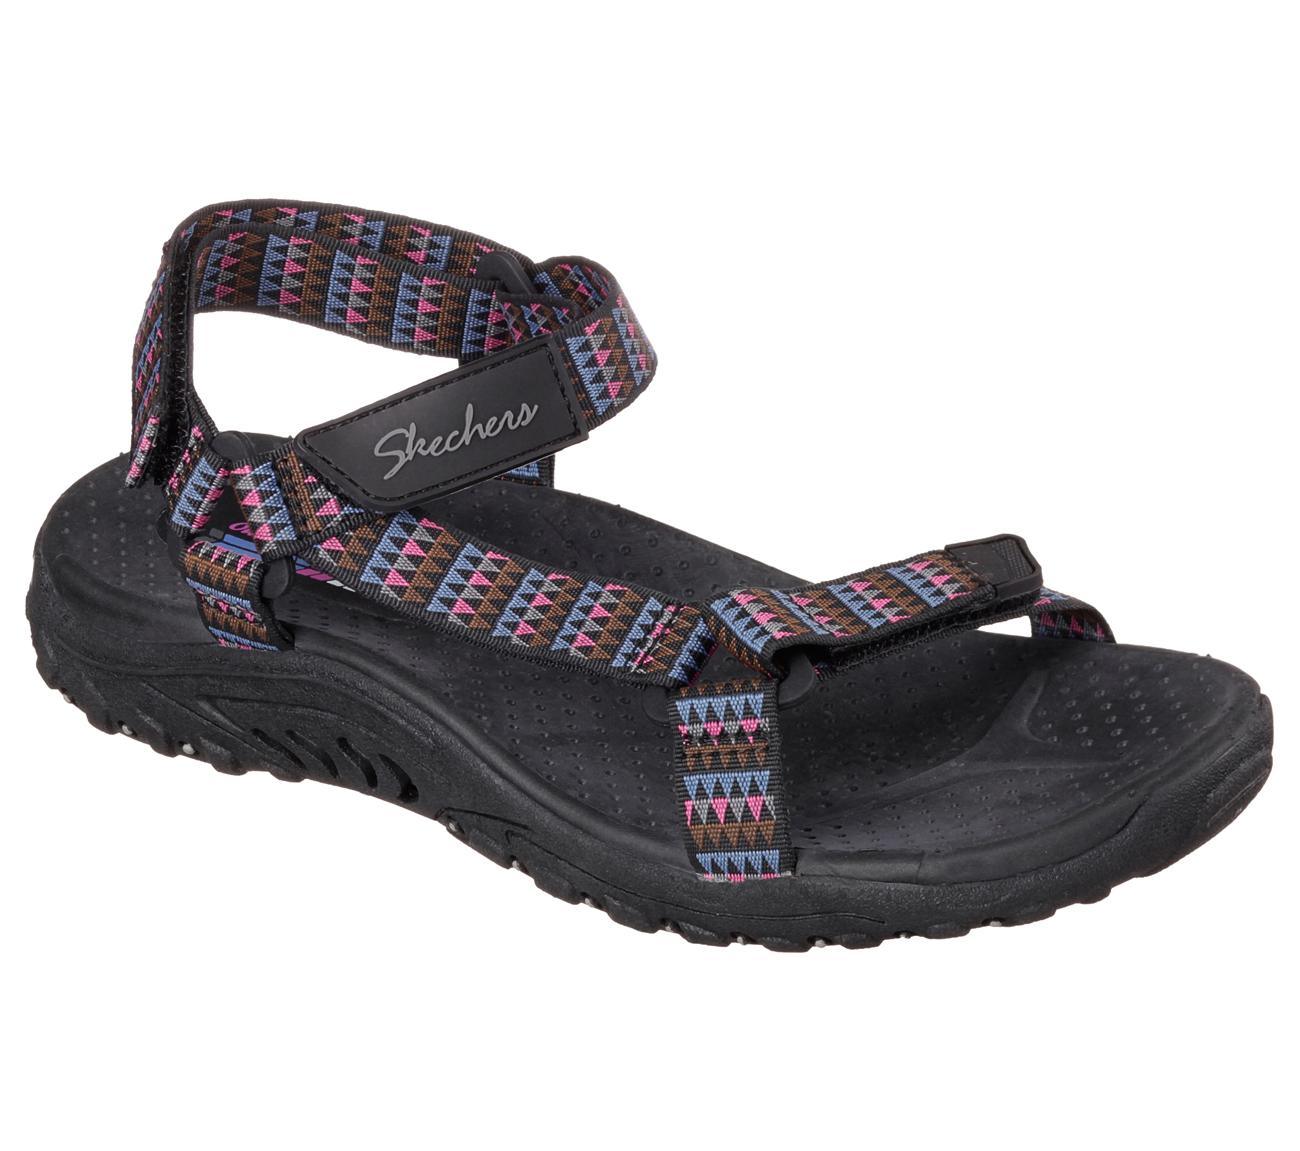 Buy Skechers Reggae Redemption Modern Comfort Shoes Only